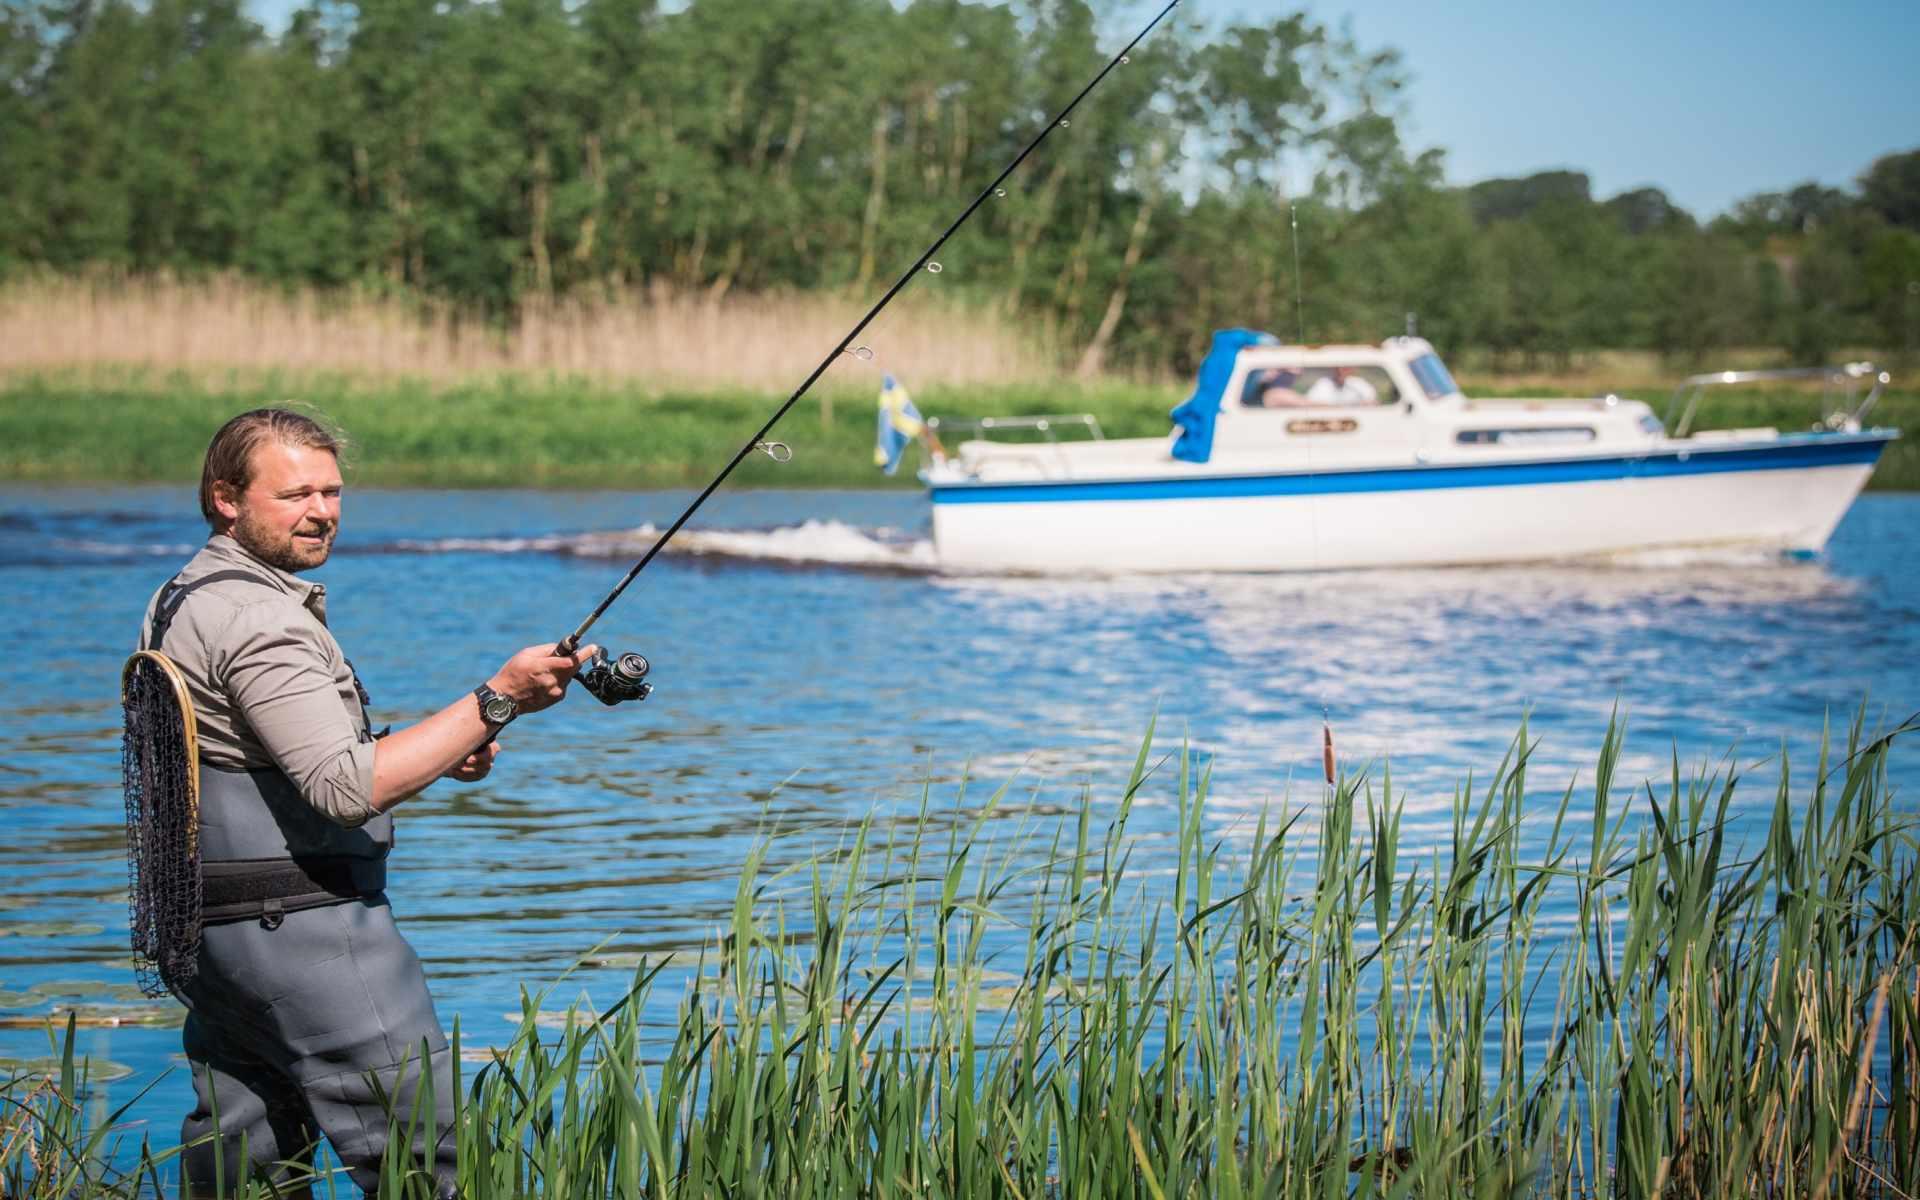 Prova fiskelyckan